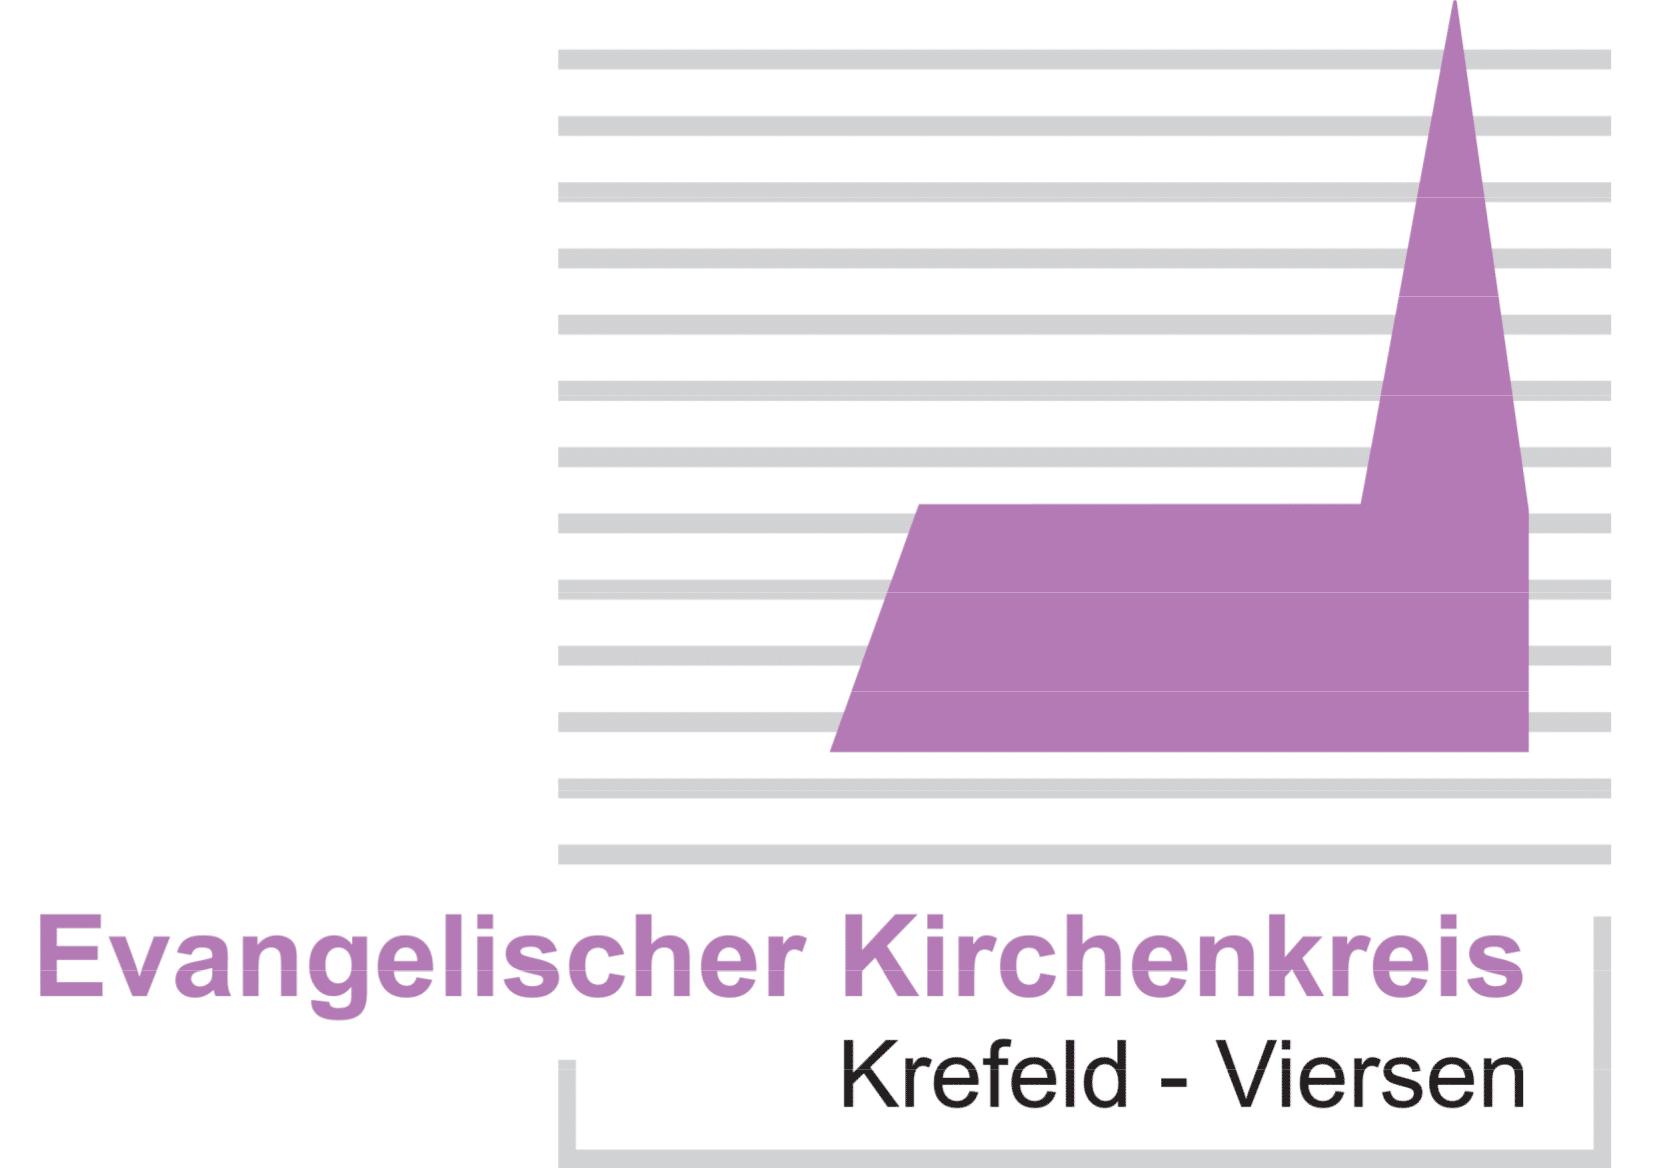 Kirchenkreis Krefeld Viersen